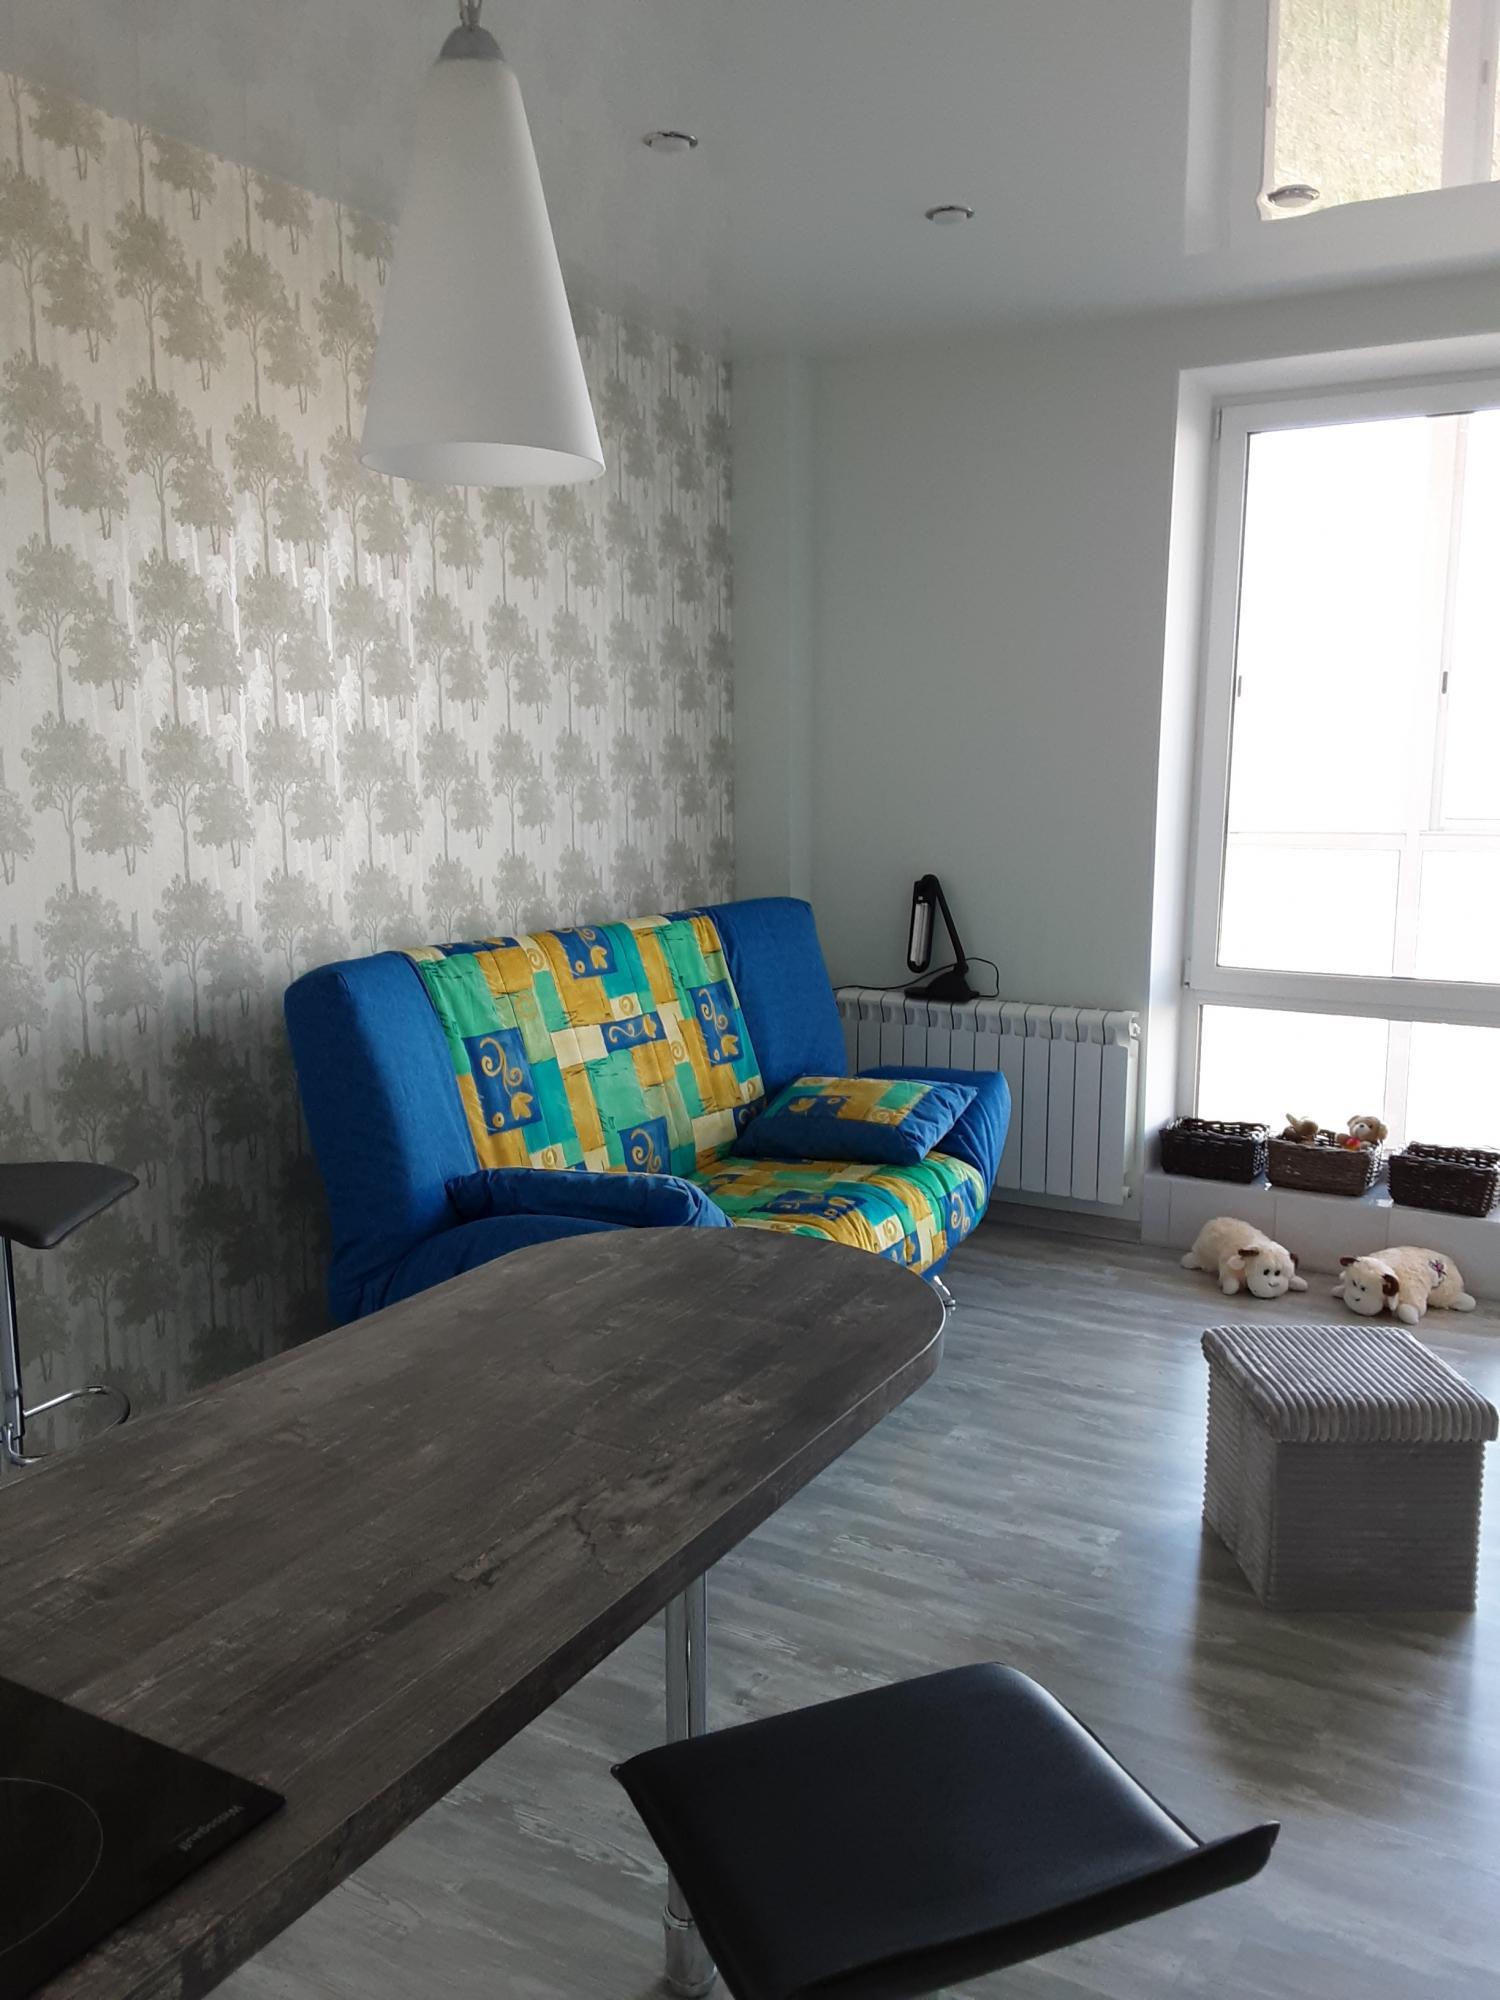 Apartment, Studio, 26 m2 in Lyubertsy 89773577037 buy 3